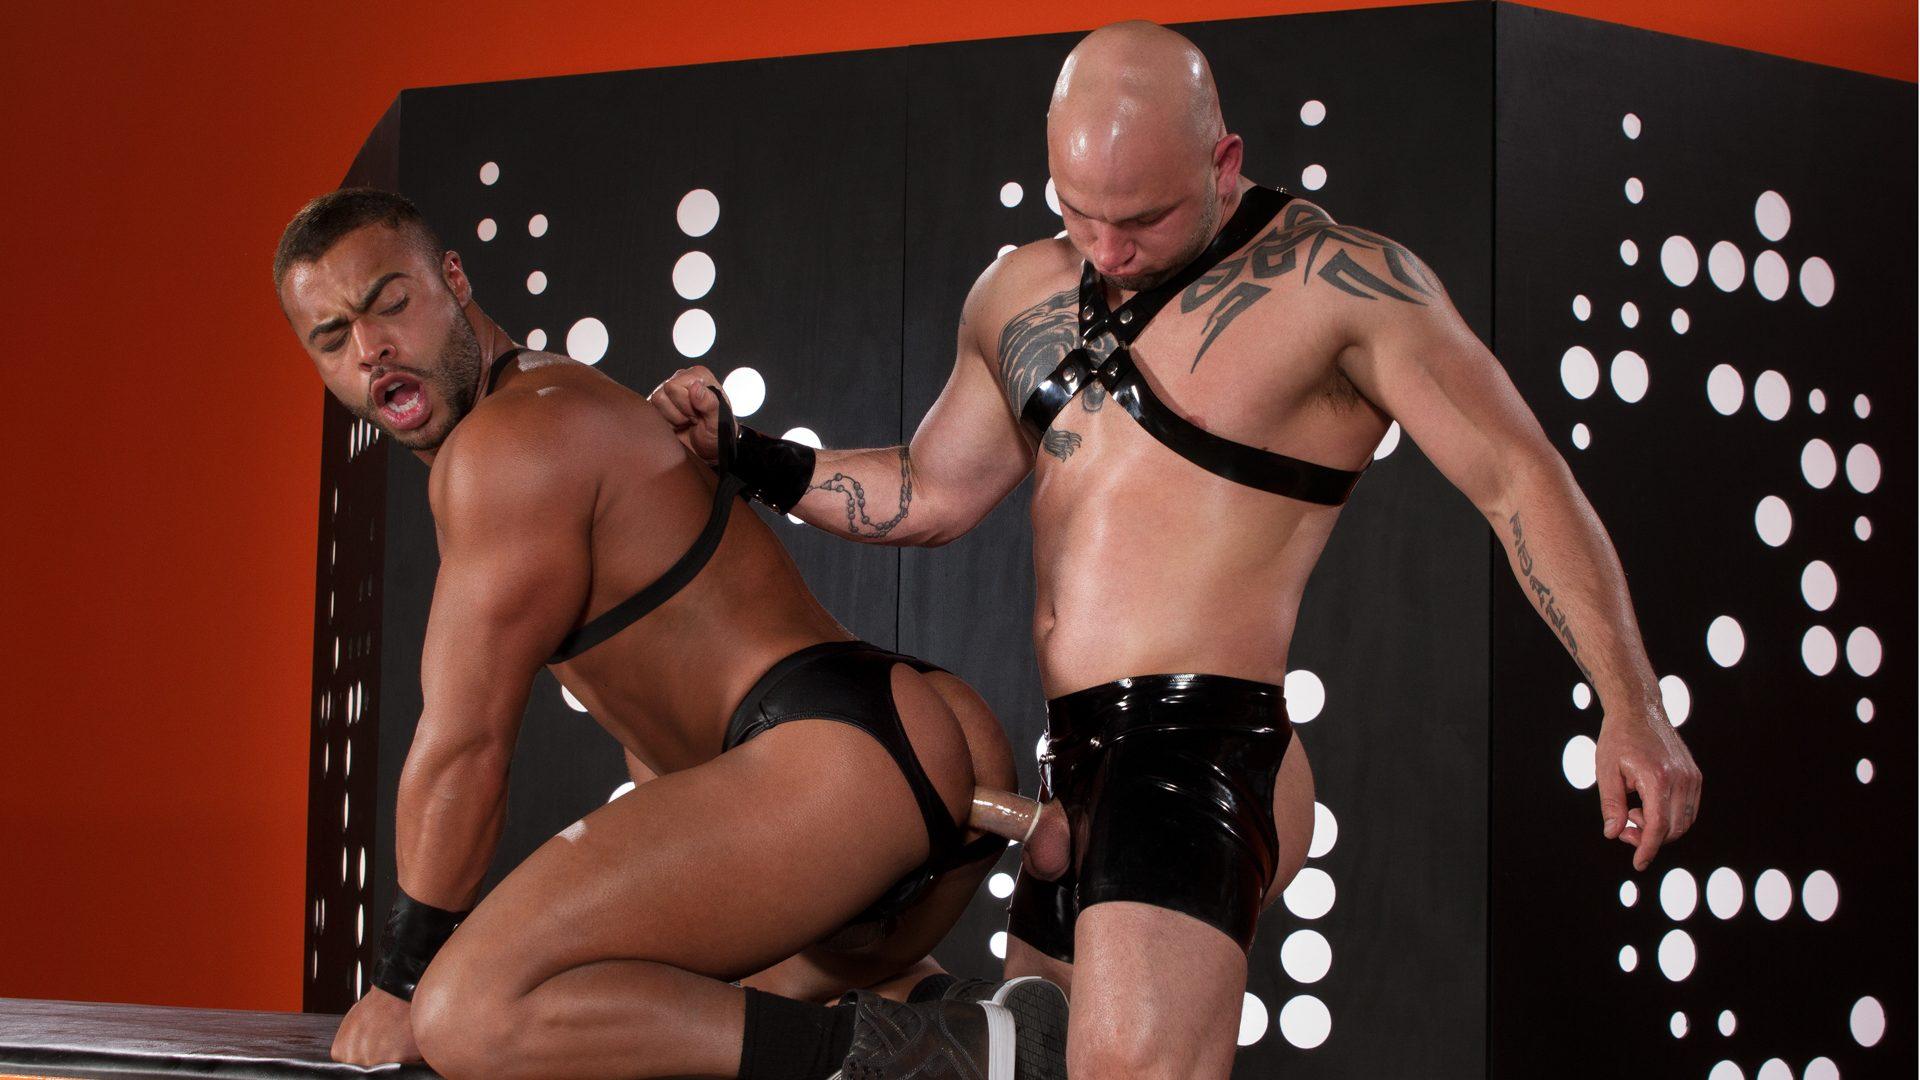 Leather Guys: Micah Brandt and Brayden Allen